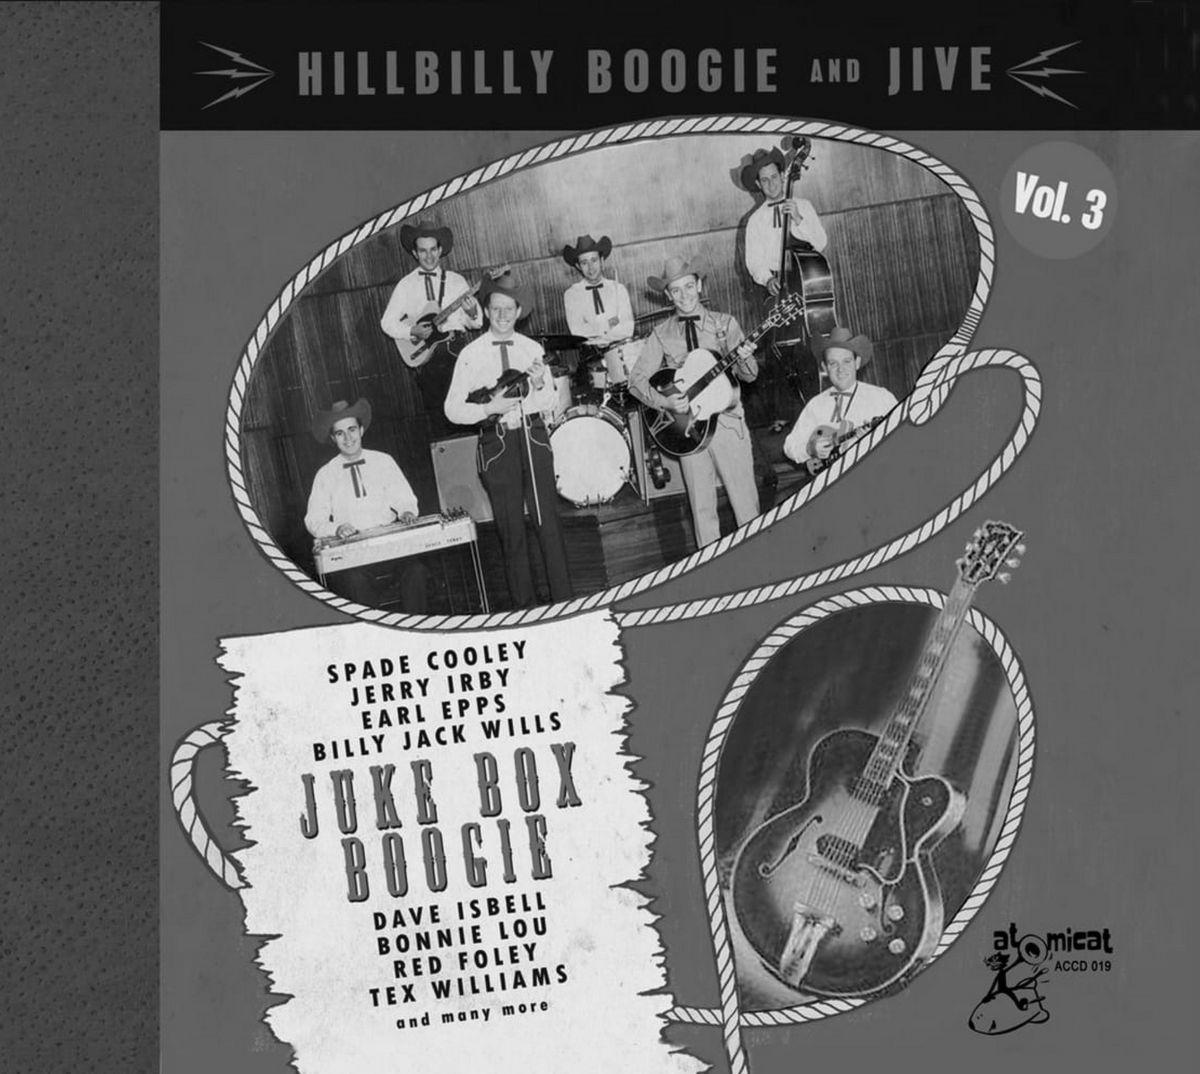 Hillbilly Boogie and jive 3